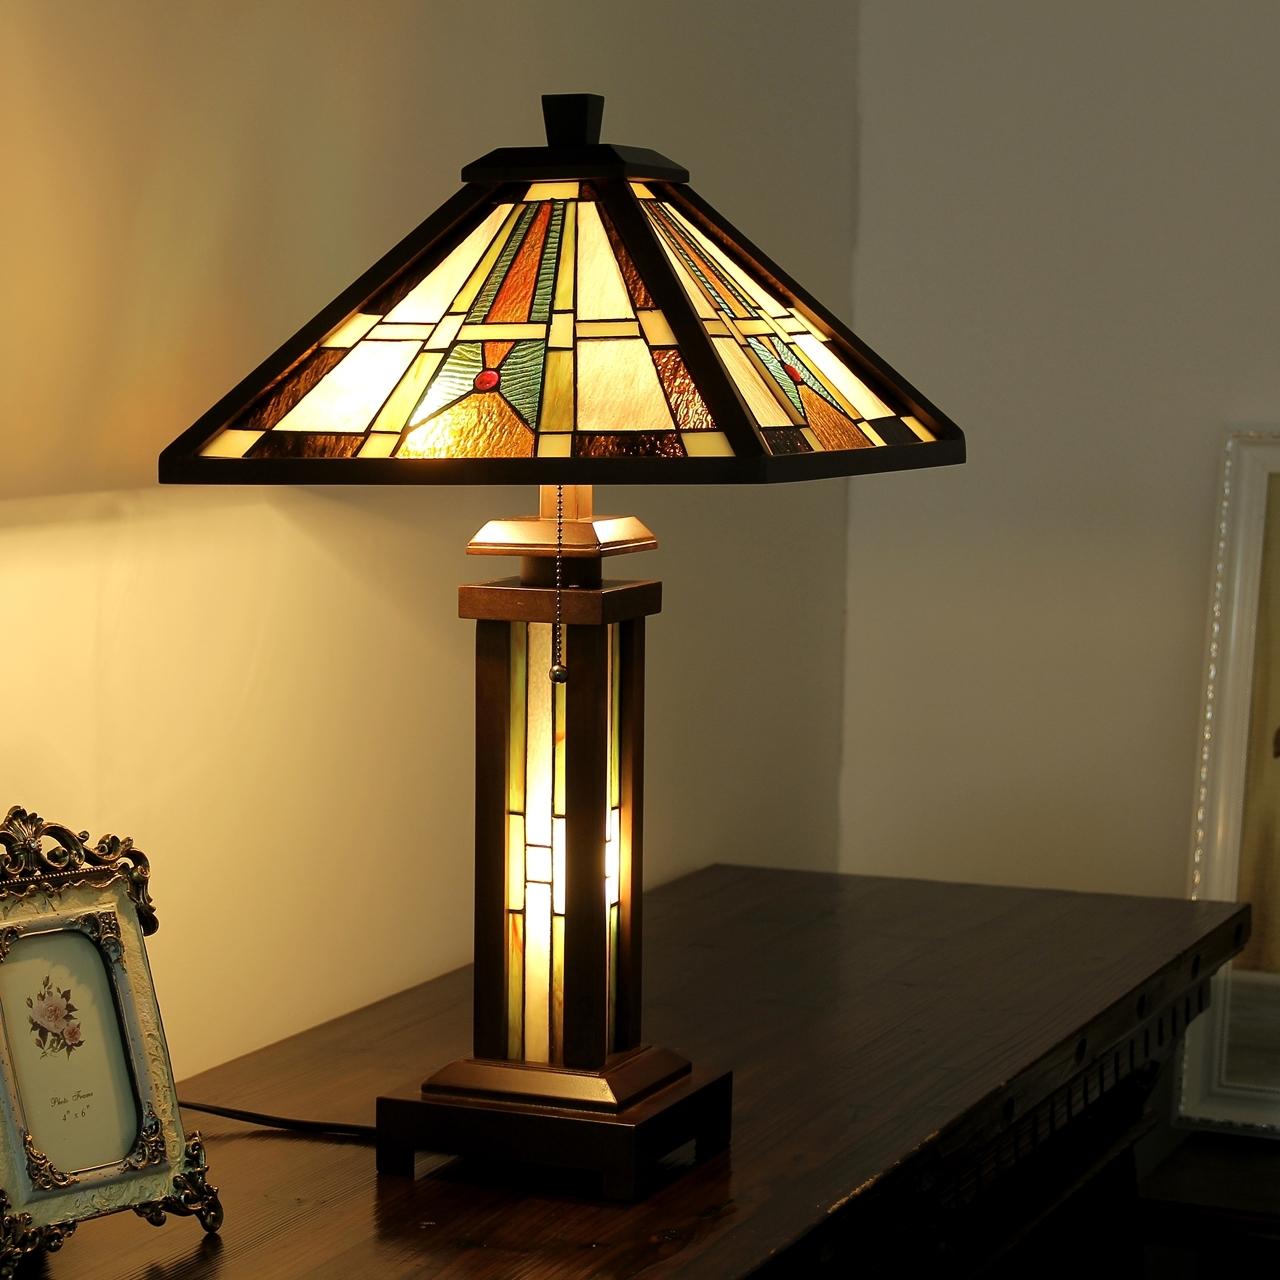 CHLOE Lighting, Inc Tiffany Lamp, Tiffany Lamps, Tiffany Style lamp, Tiffany Style Lamps ...